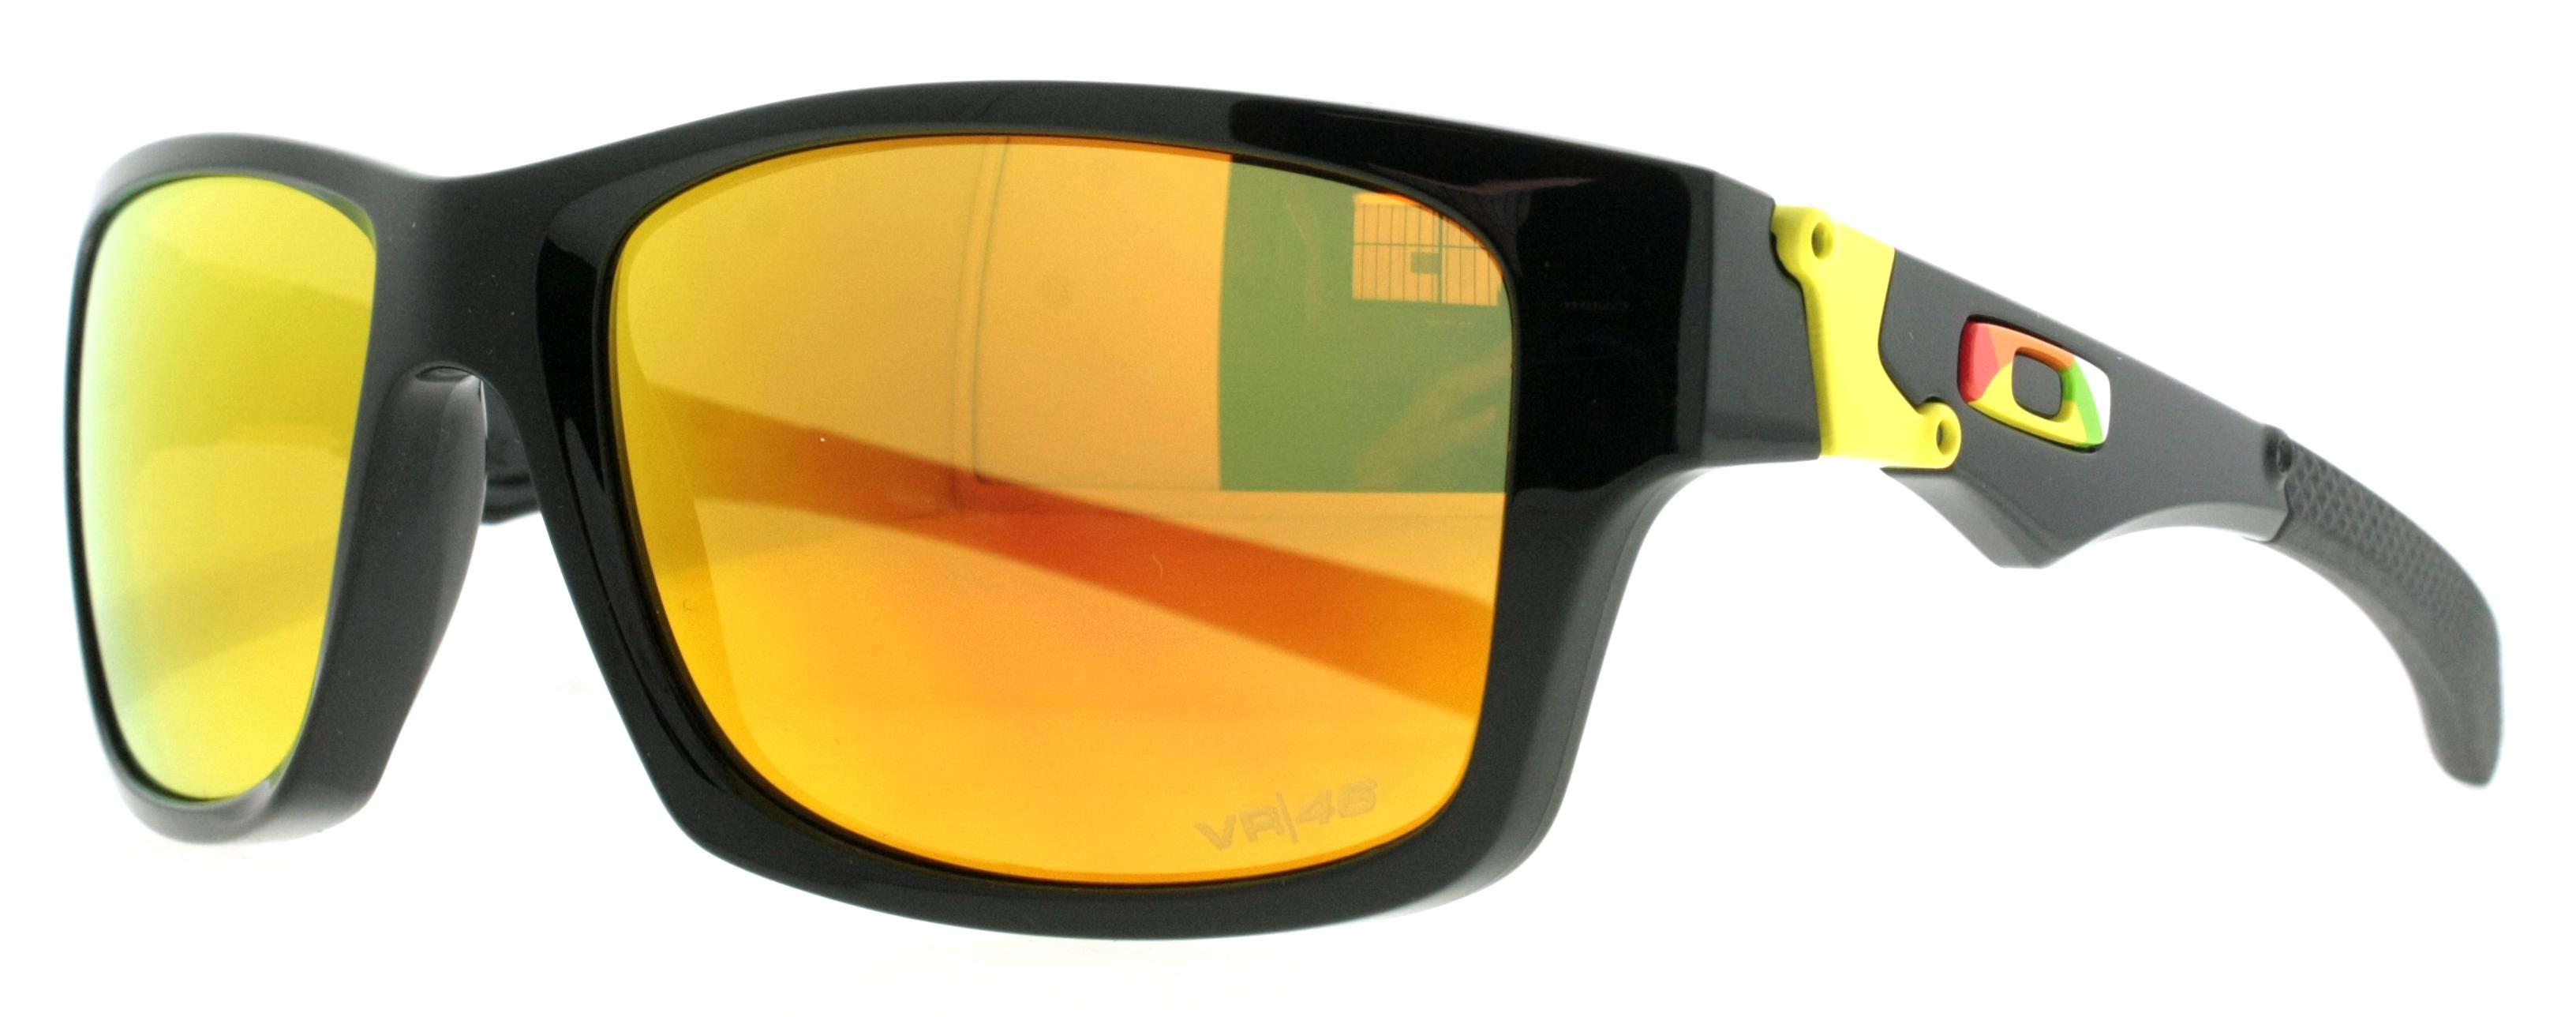 5fb88a37e1 Oakley Jupiter Crystal Black Fire Iridium Sunglasses